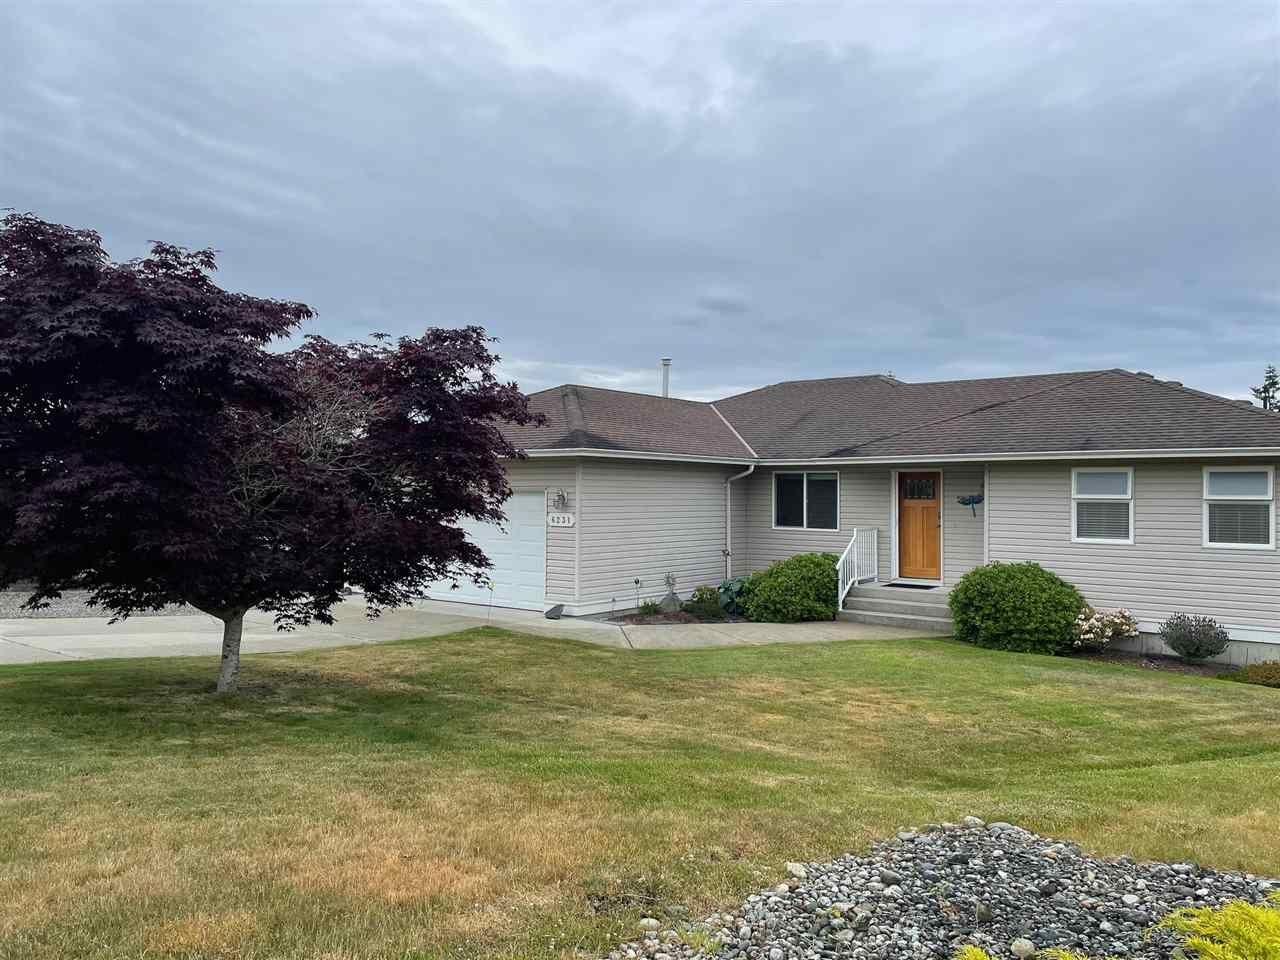 Main Photo: 6231 SUNRISE Boulevard in Sechelt: Sechelt District House for sale (Sunshine Coast)  : MLS®# R2589501